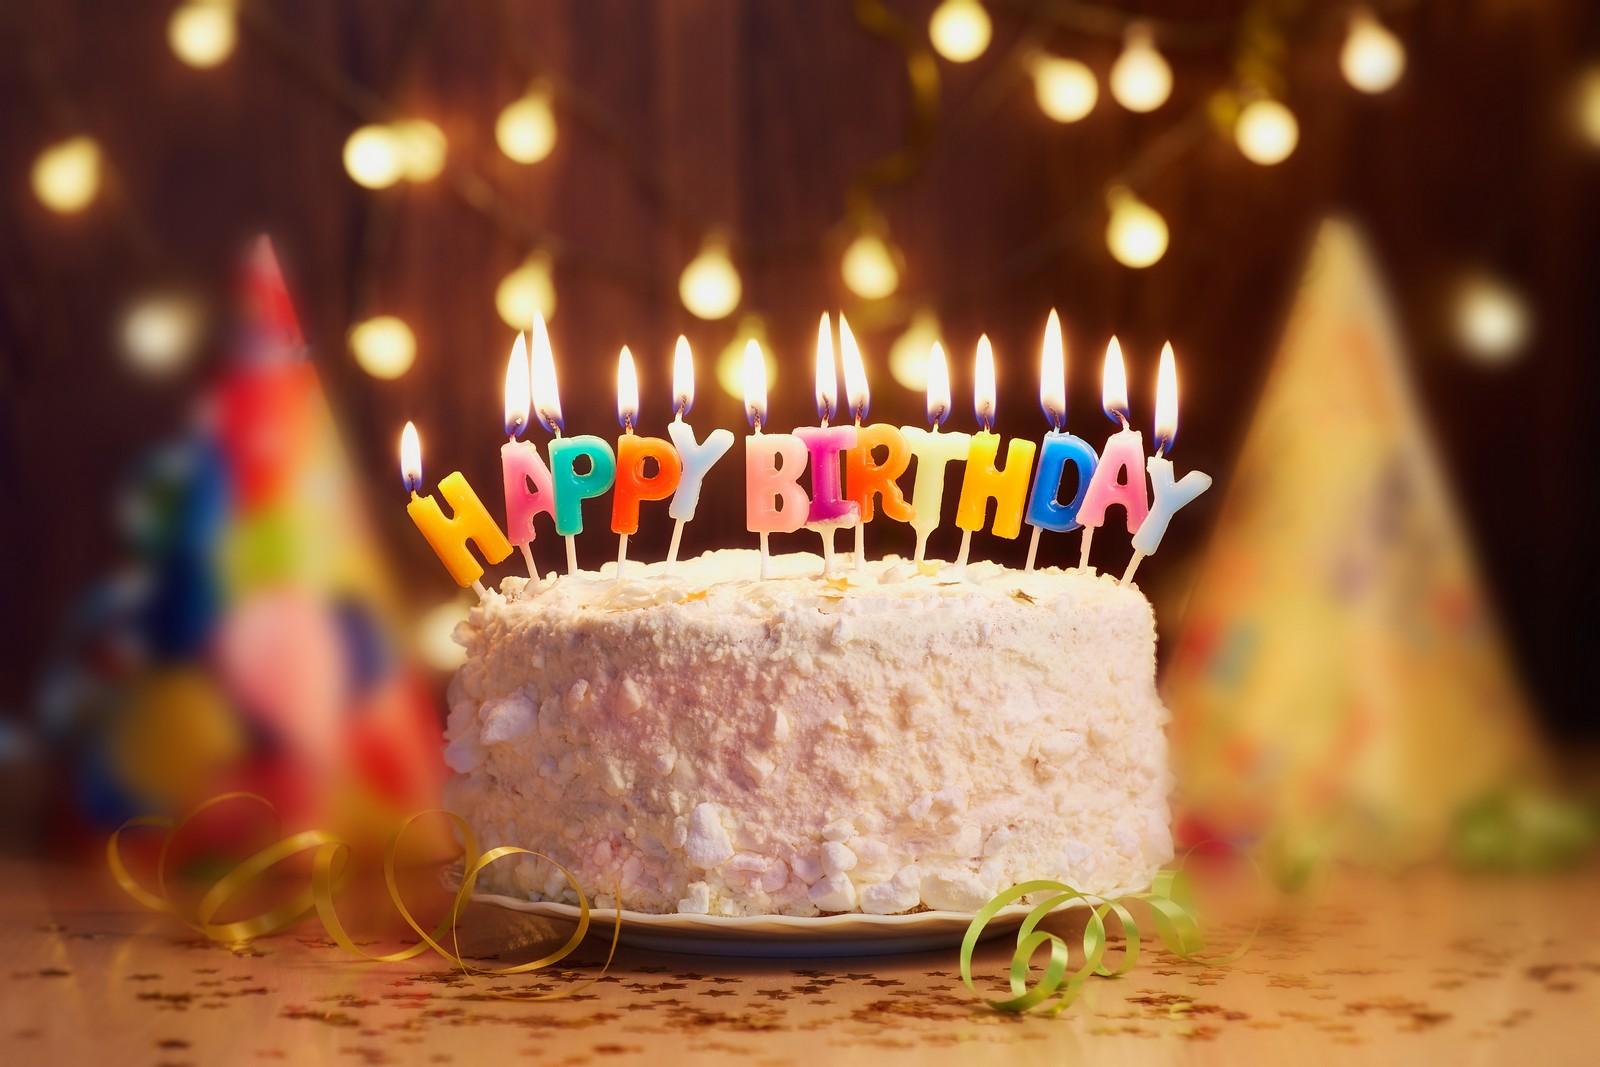 http://drouga.com/cms/wp-content/uploads/2018/05/birthday.jpg